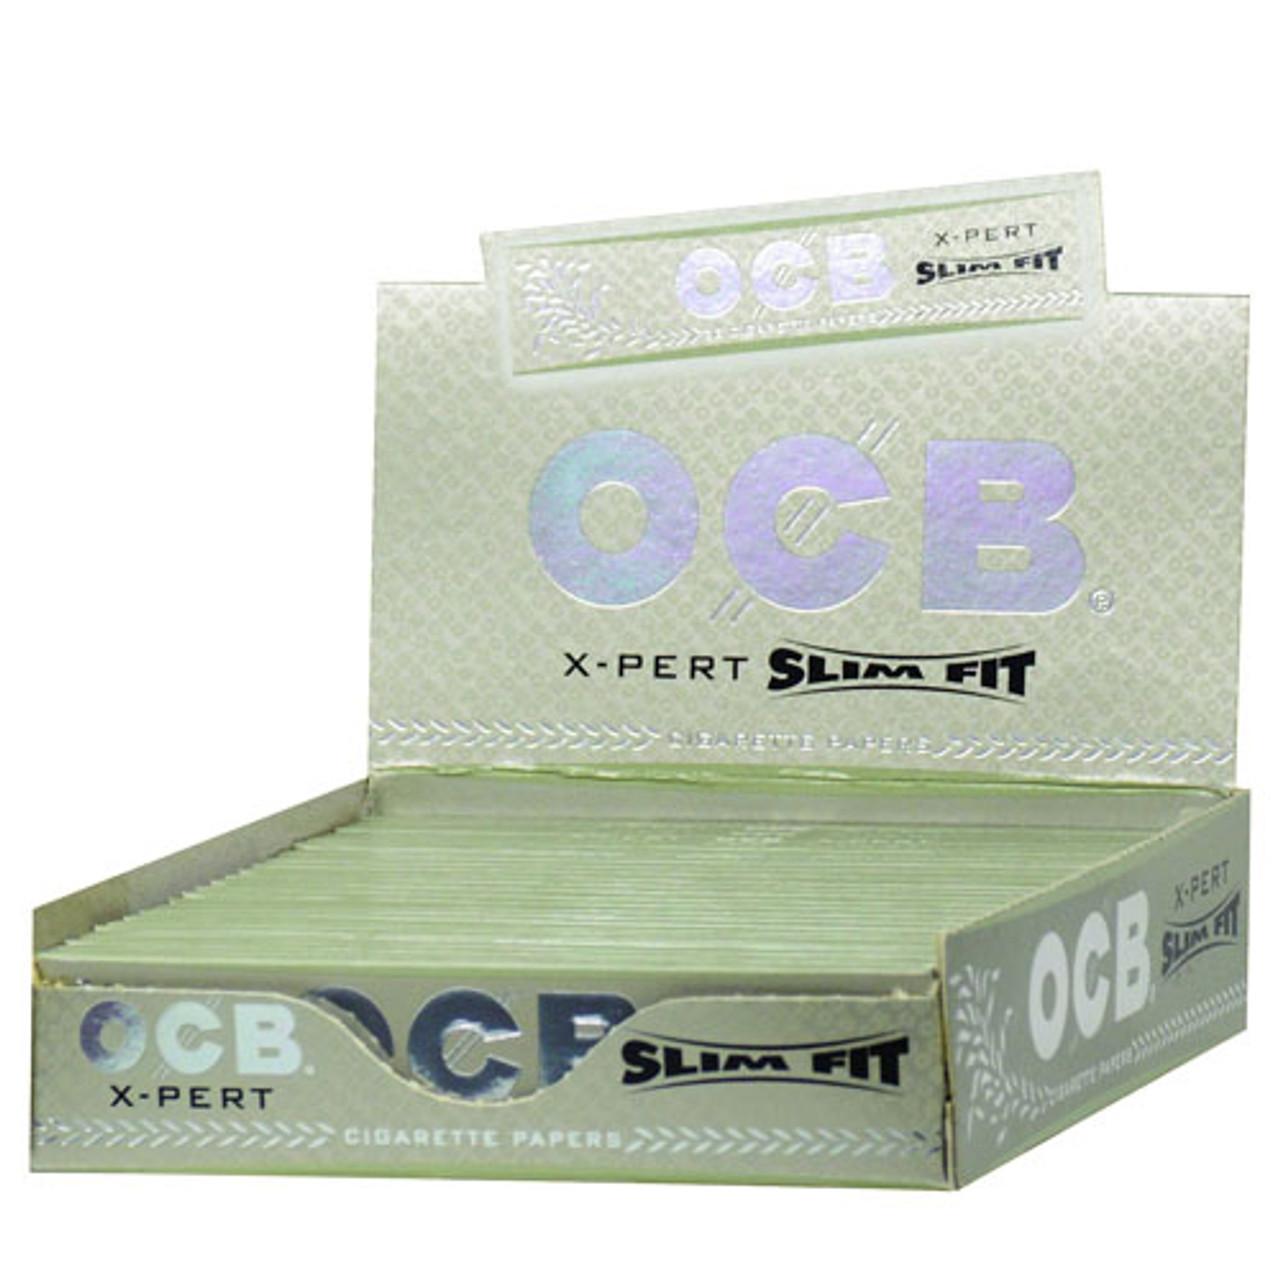 OCB - X-Pert  - Slim Size - Display with 24 Units